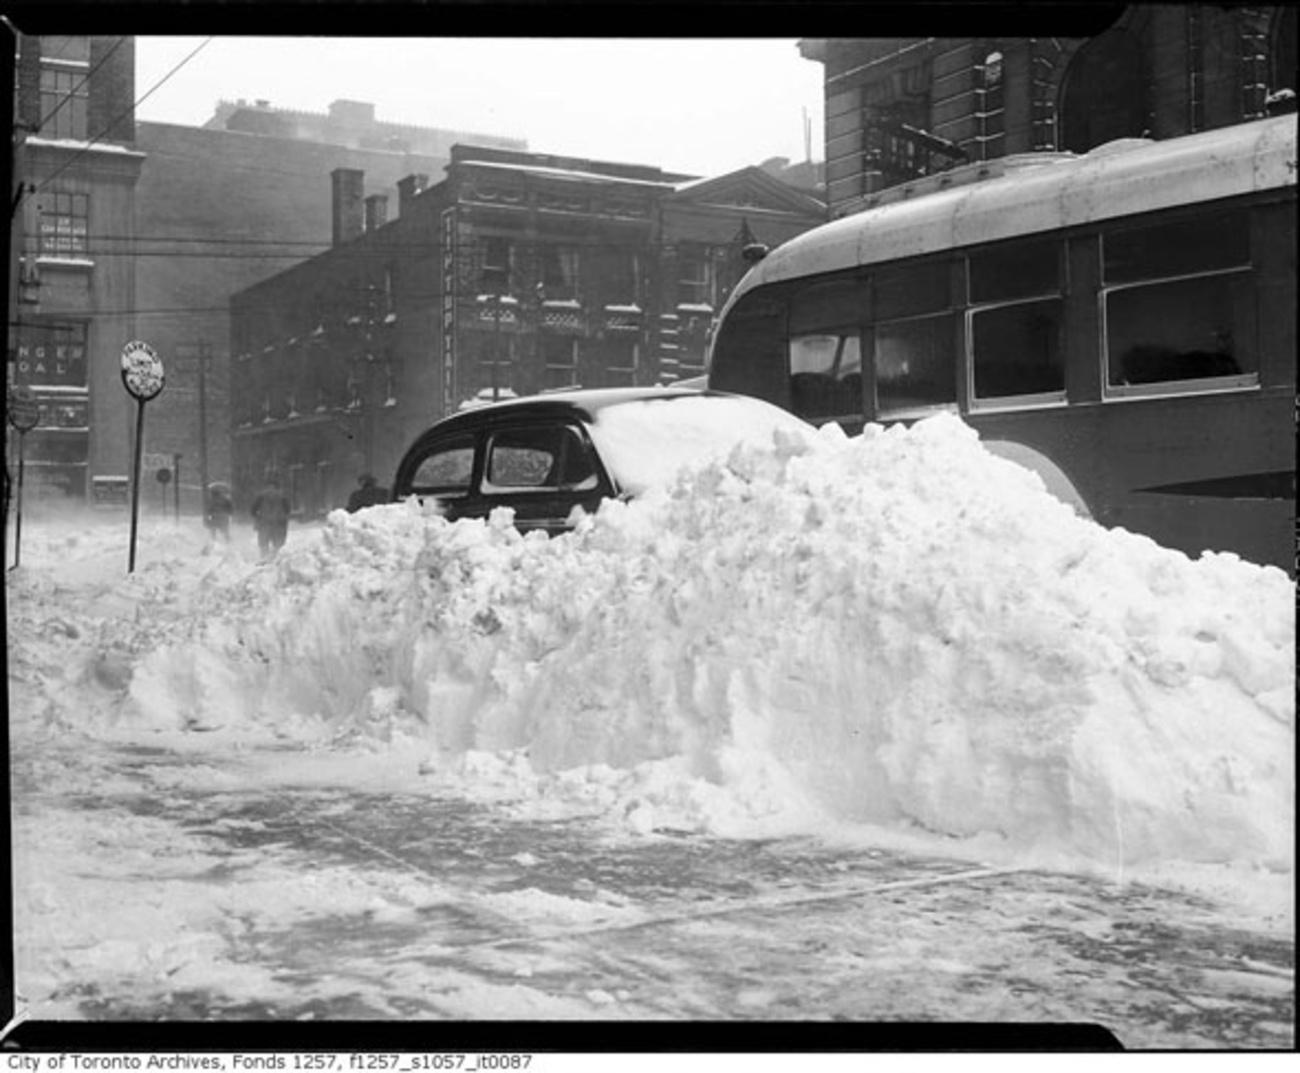 Snow Storm Toronto: The Time Toronto Was Buried Under Half A Metre Of Snow